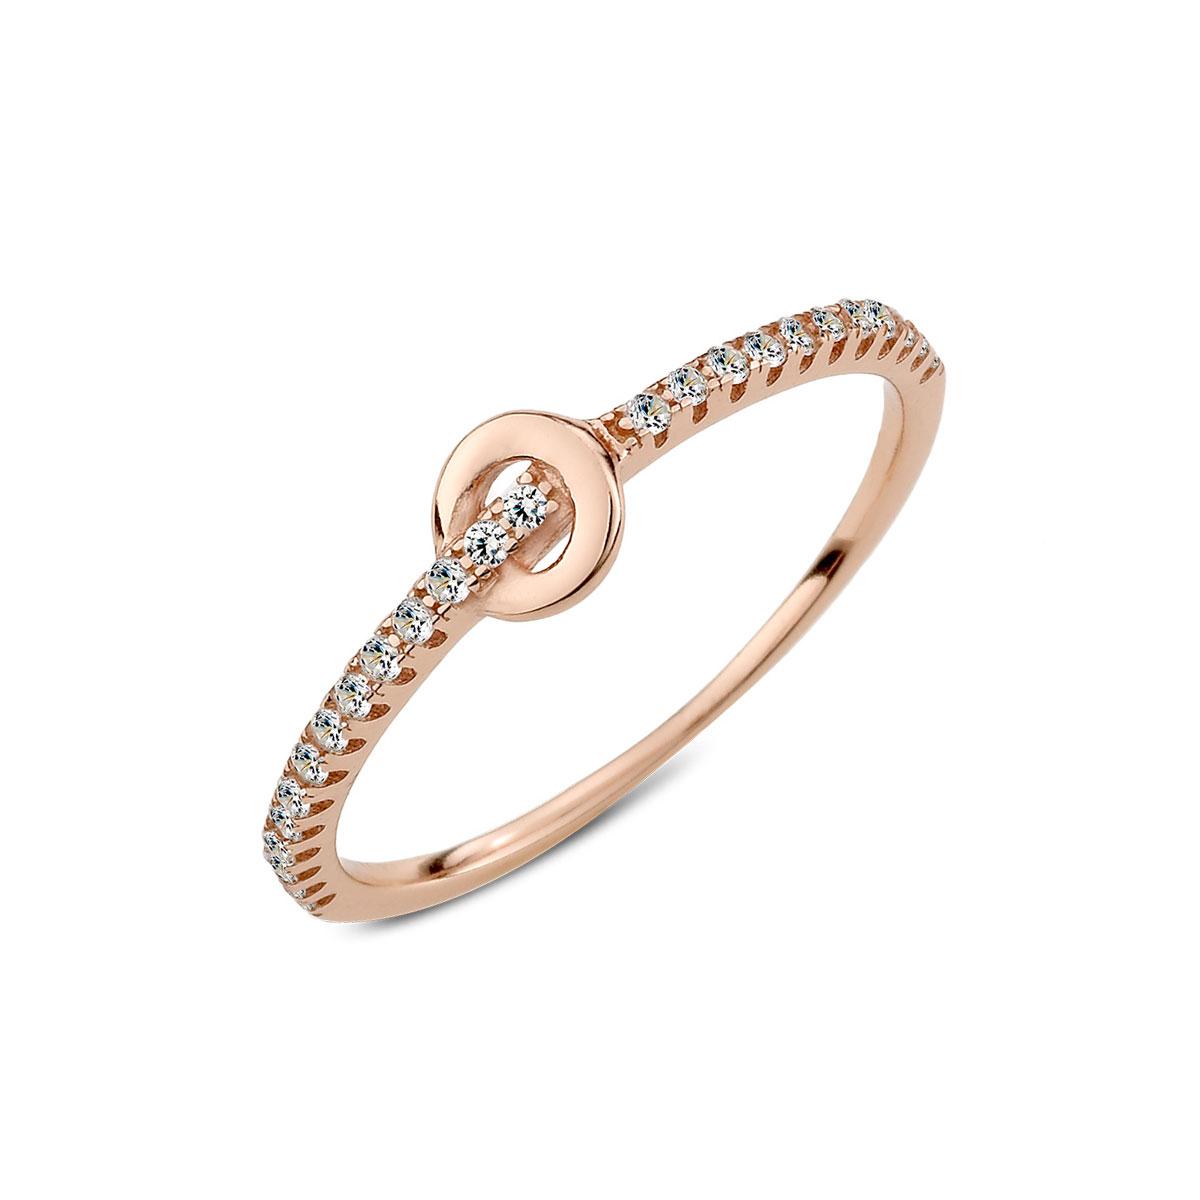 KSW226 典雅設計彩鑽戒指